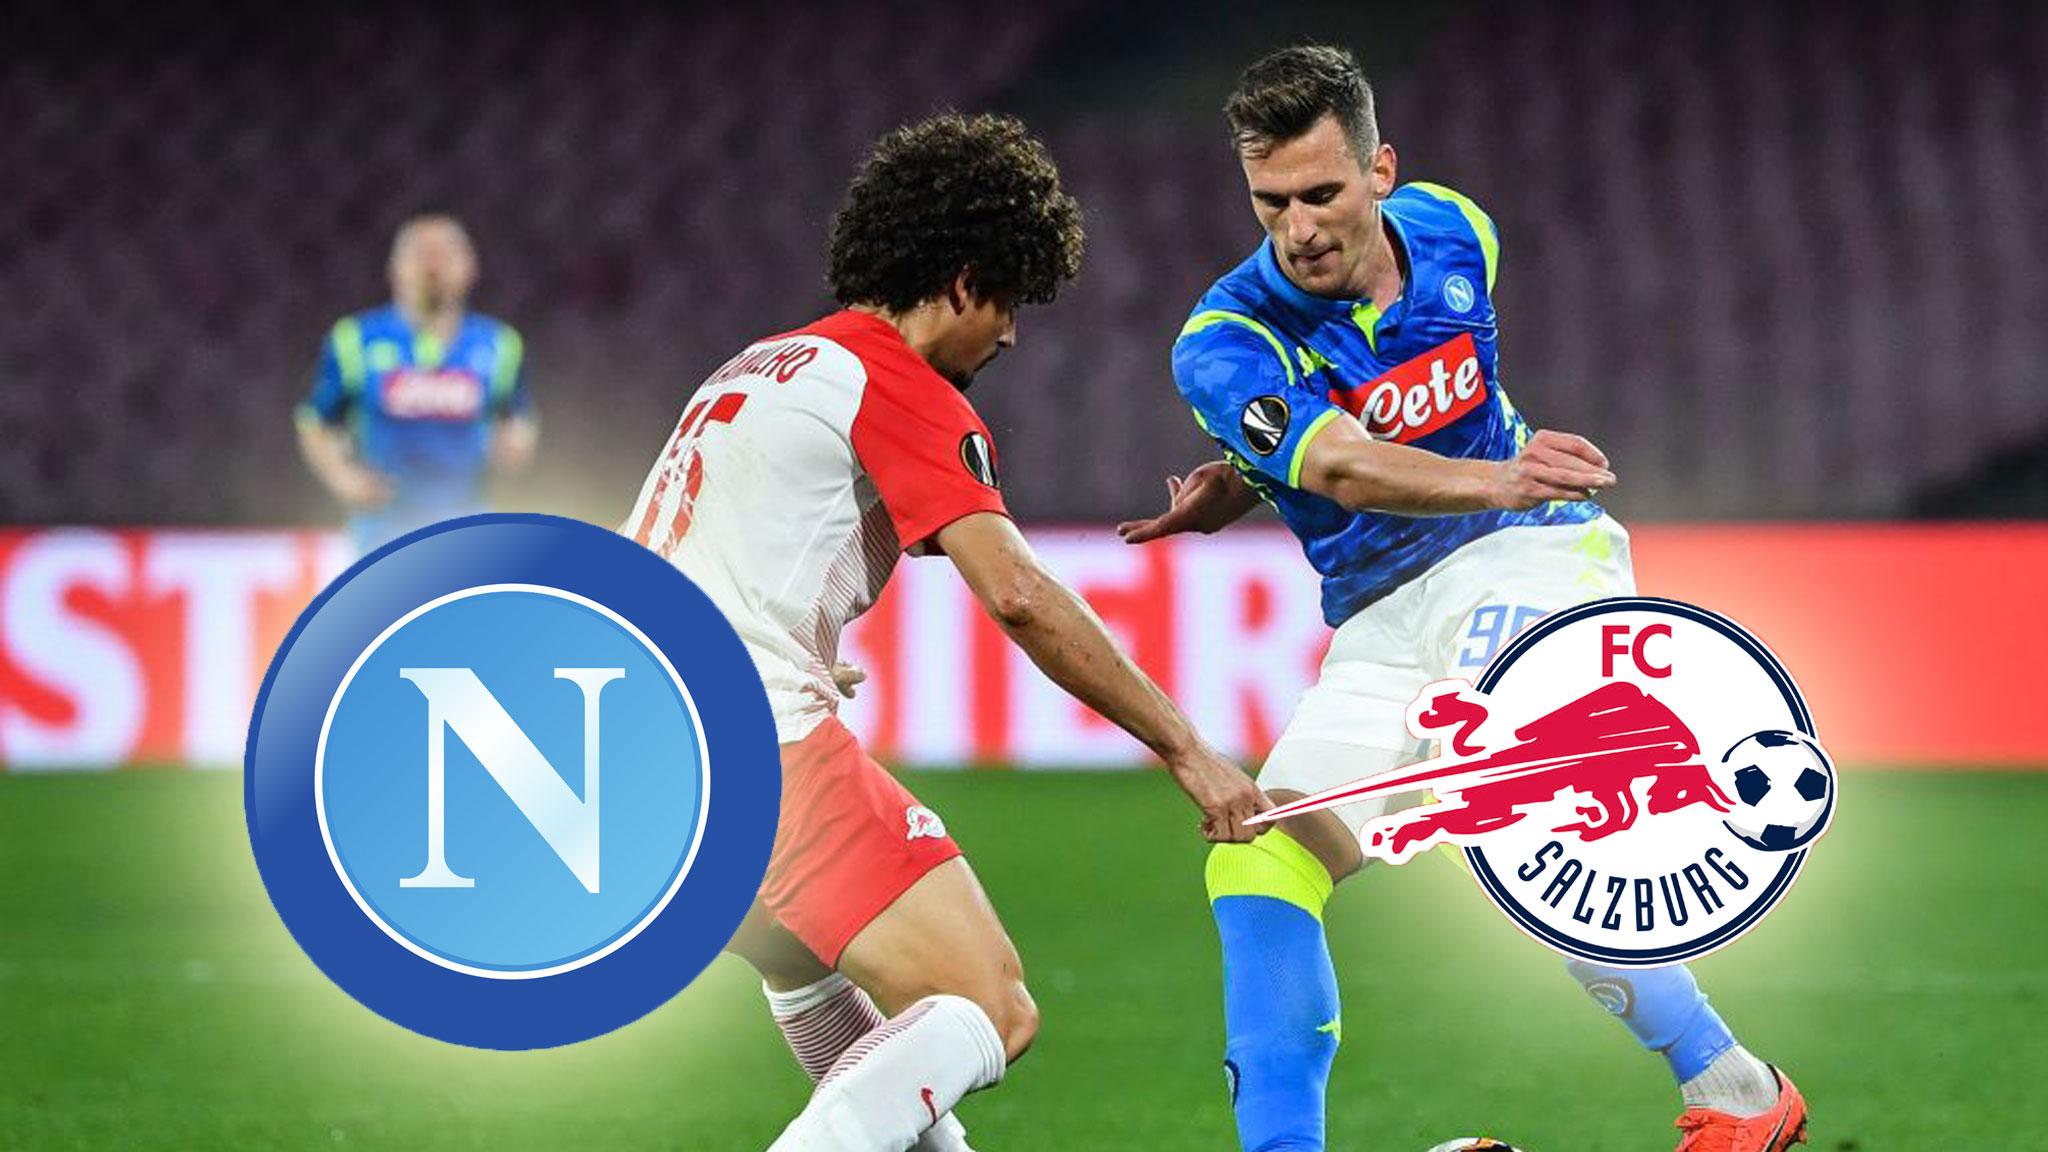 SSC Neapel Vs FC Red Bull Salzburg Heute Live Im TV Und